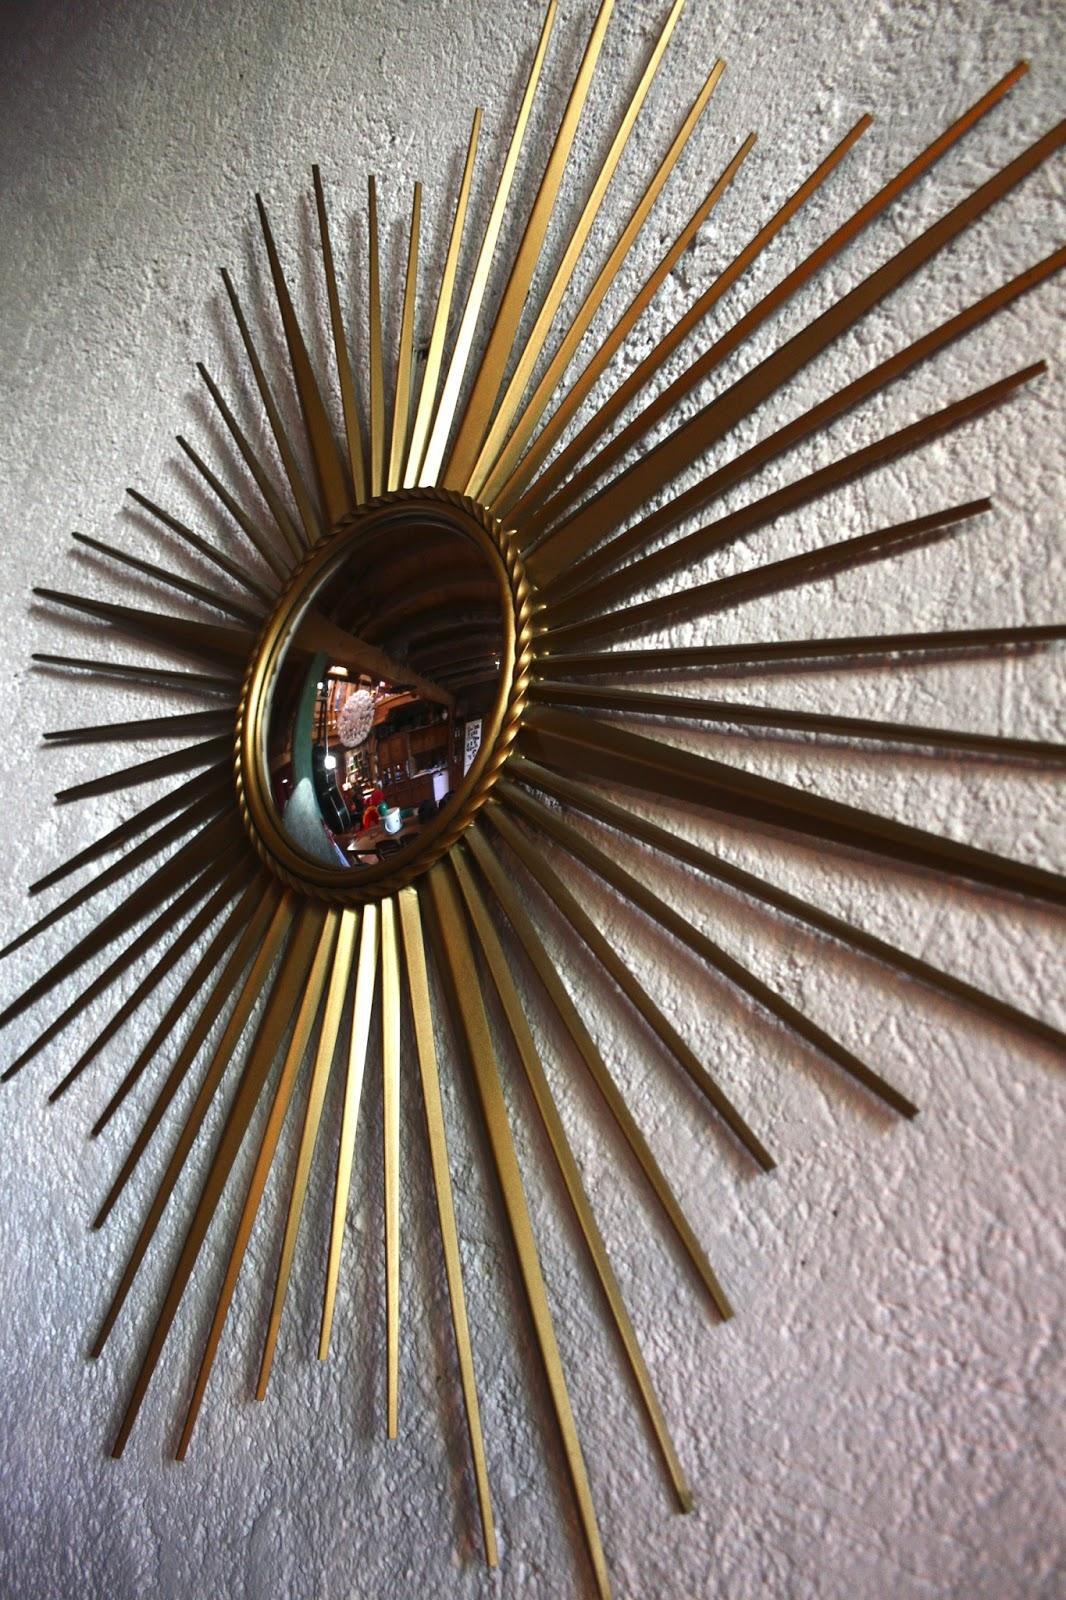 Chicbaazar objets vintage 50 60 70 miroir soleil chaty for Miroir soleil sorciere